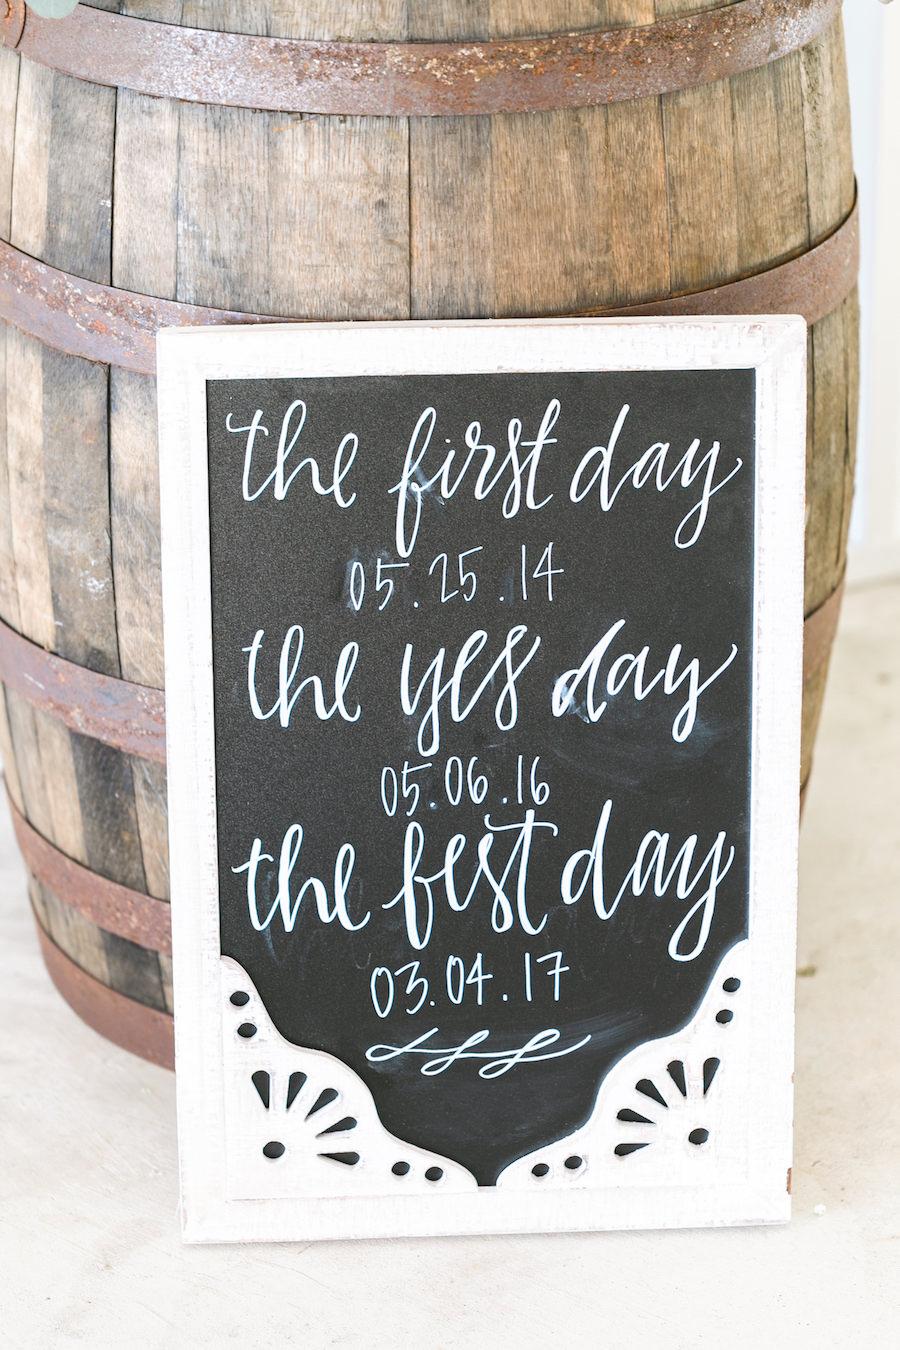 Wedding Reception Chalkboard Sign with Oak Barrel   Rustic, Country Wedding Inspiration